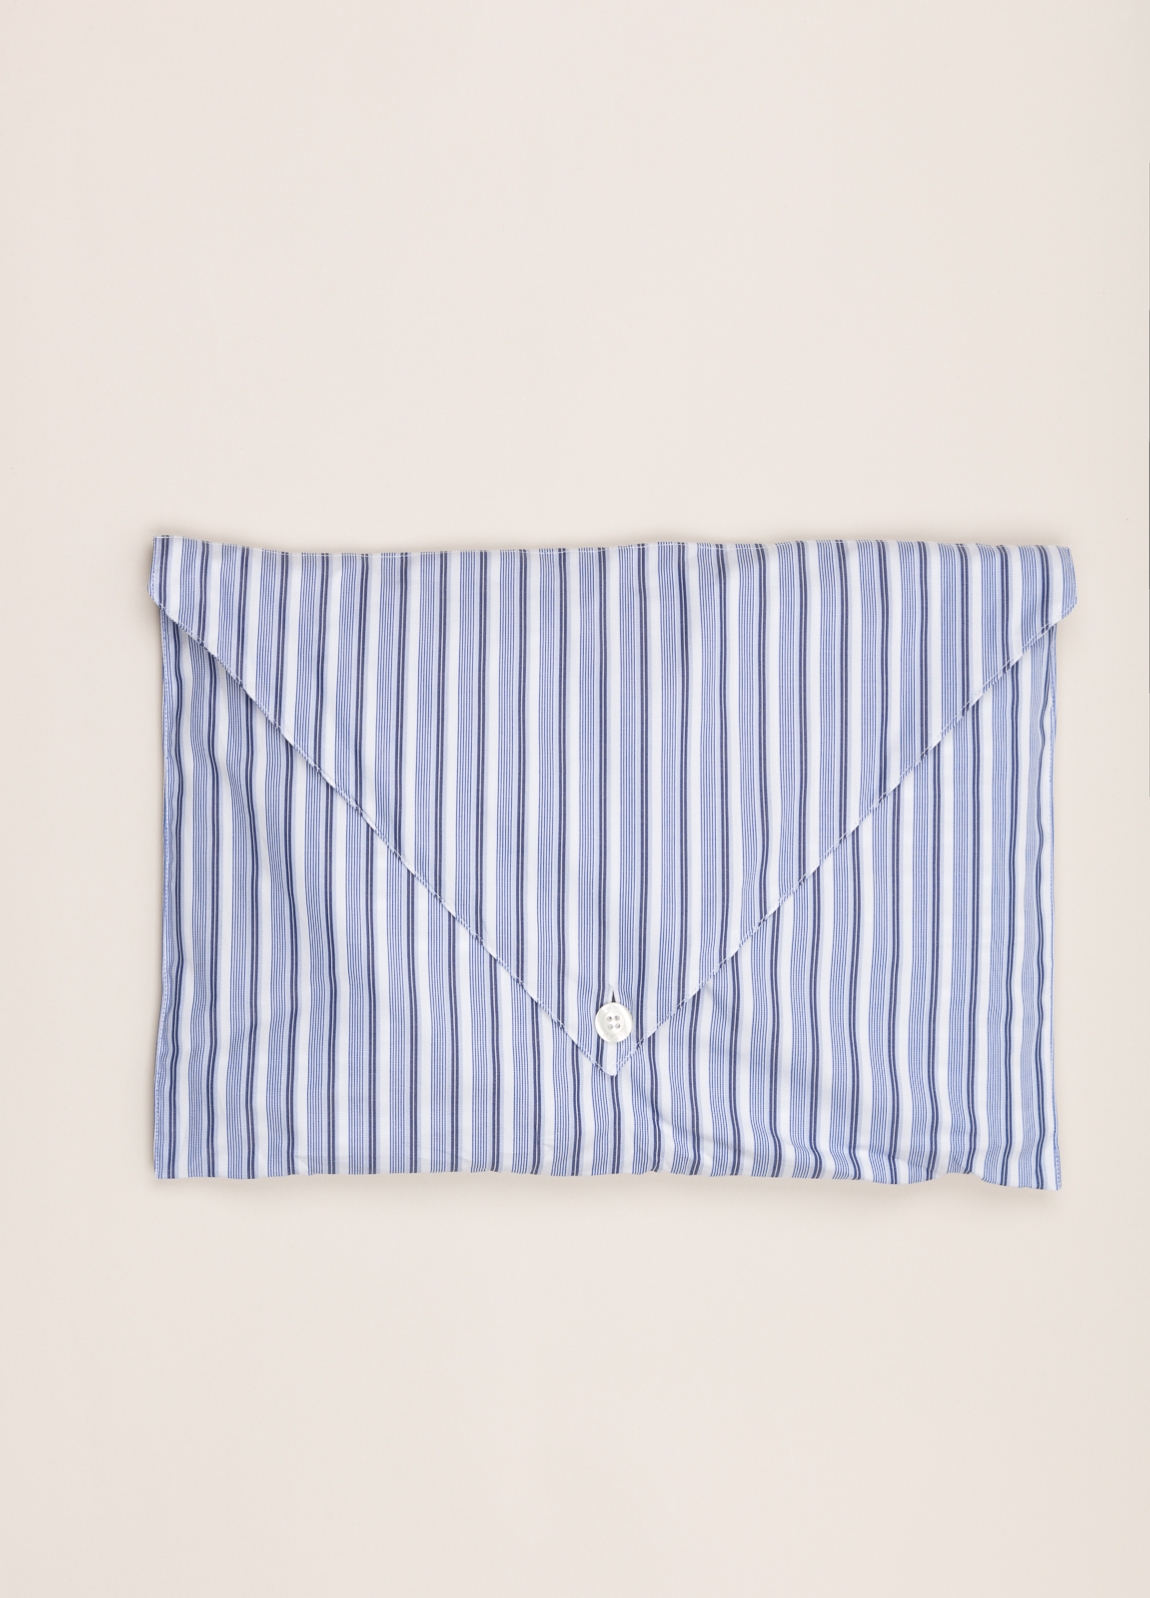 Pijama corto FUREST COLECCIÓN rayas azul - Ítem1